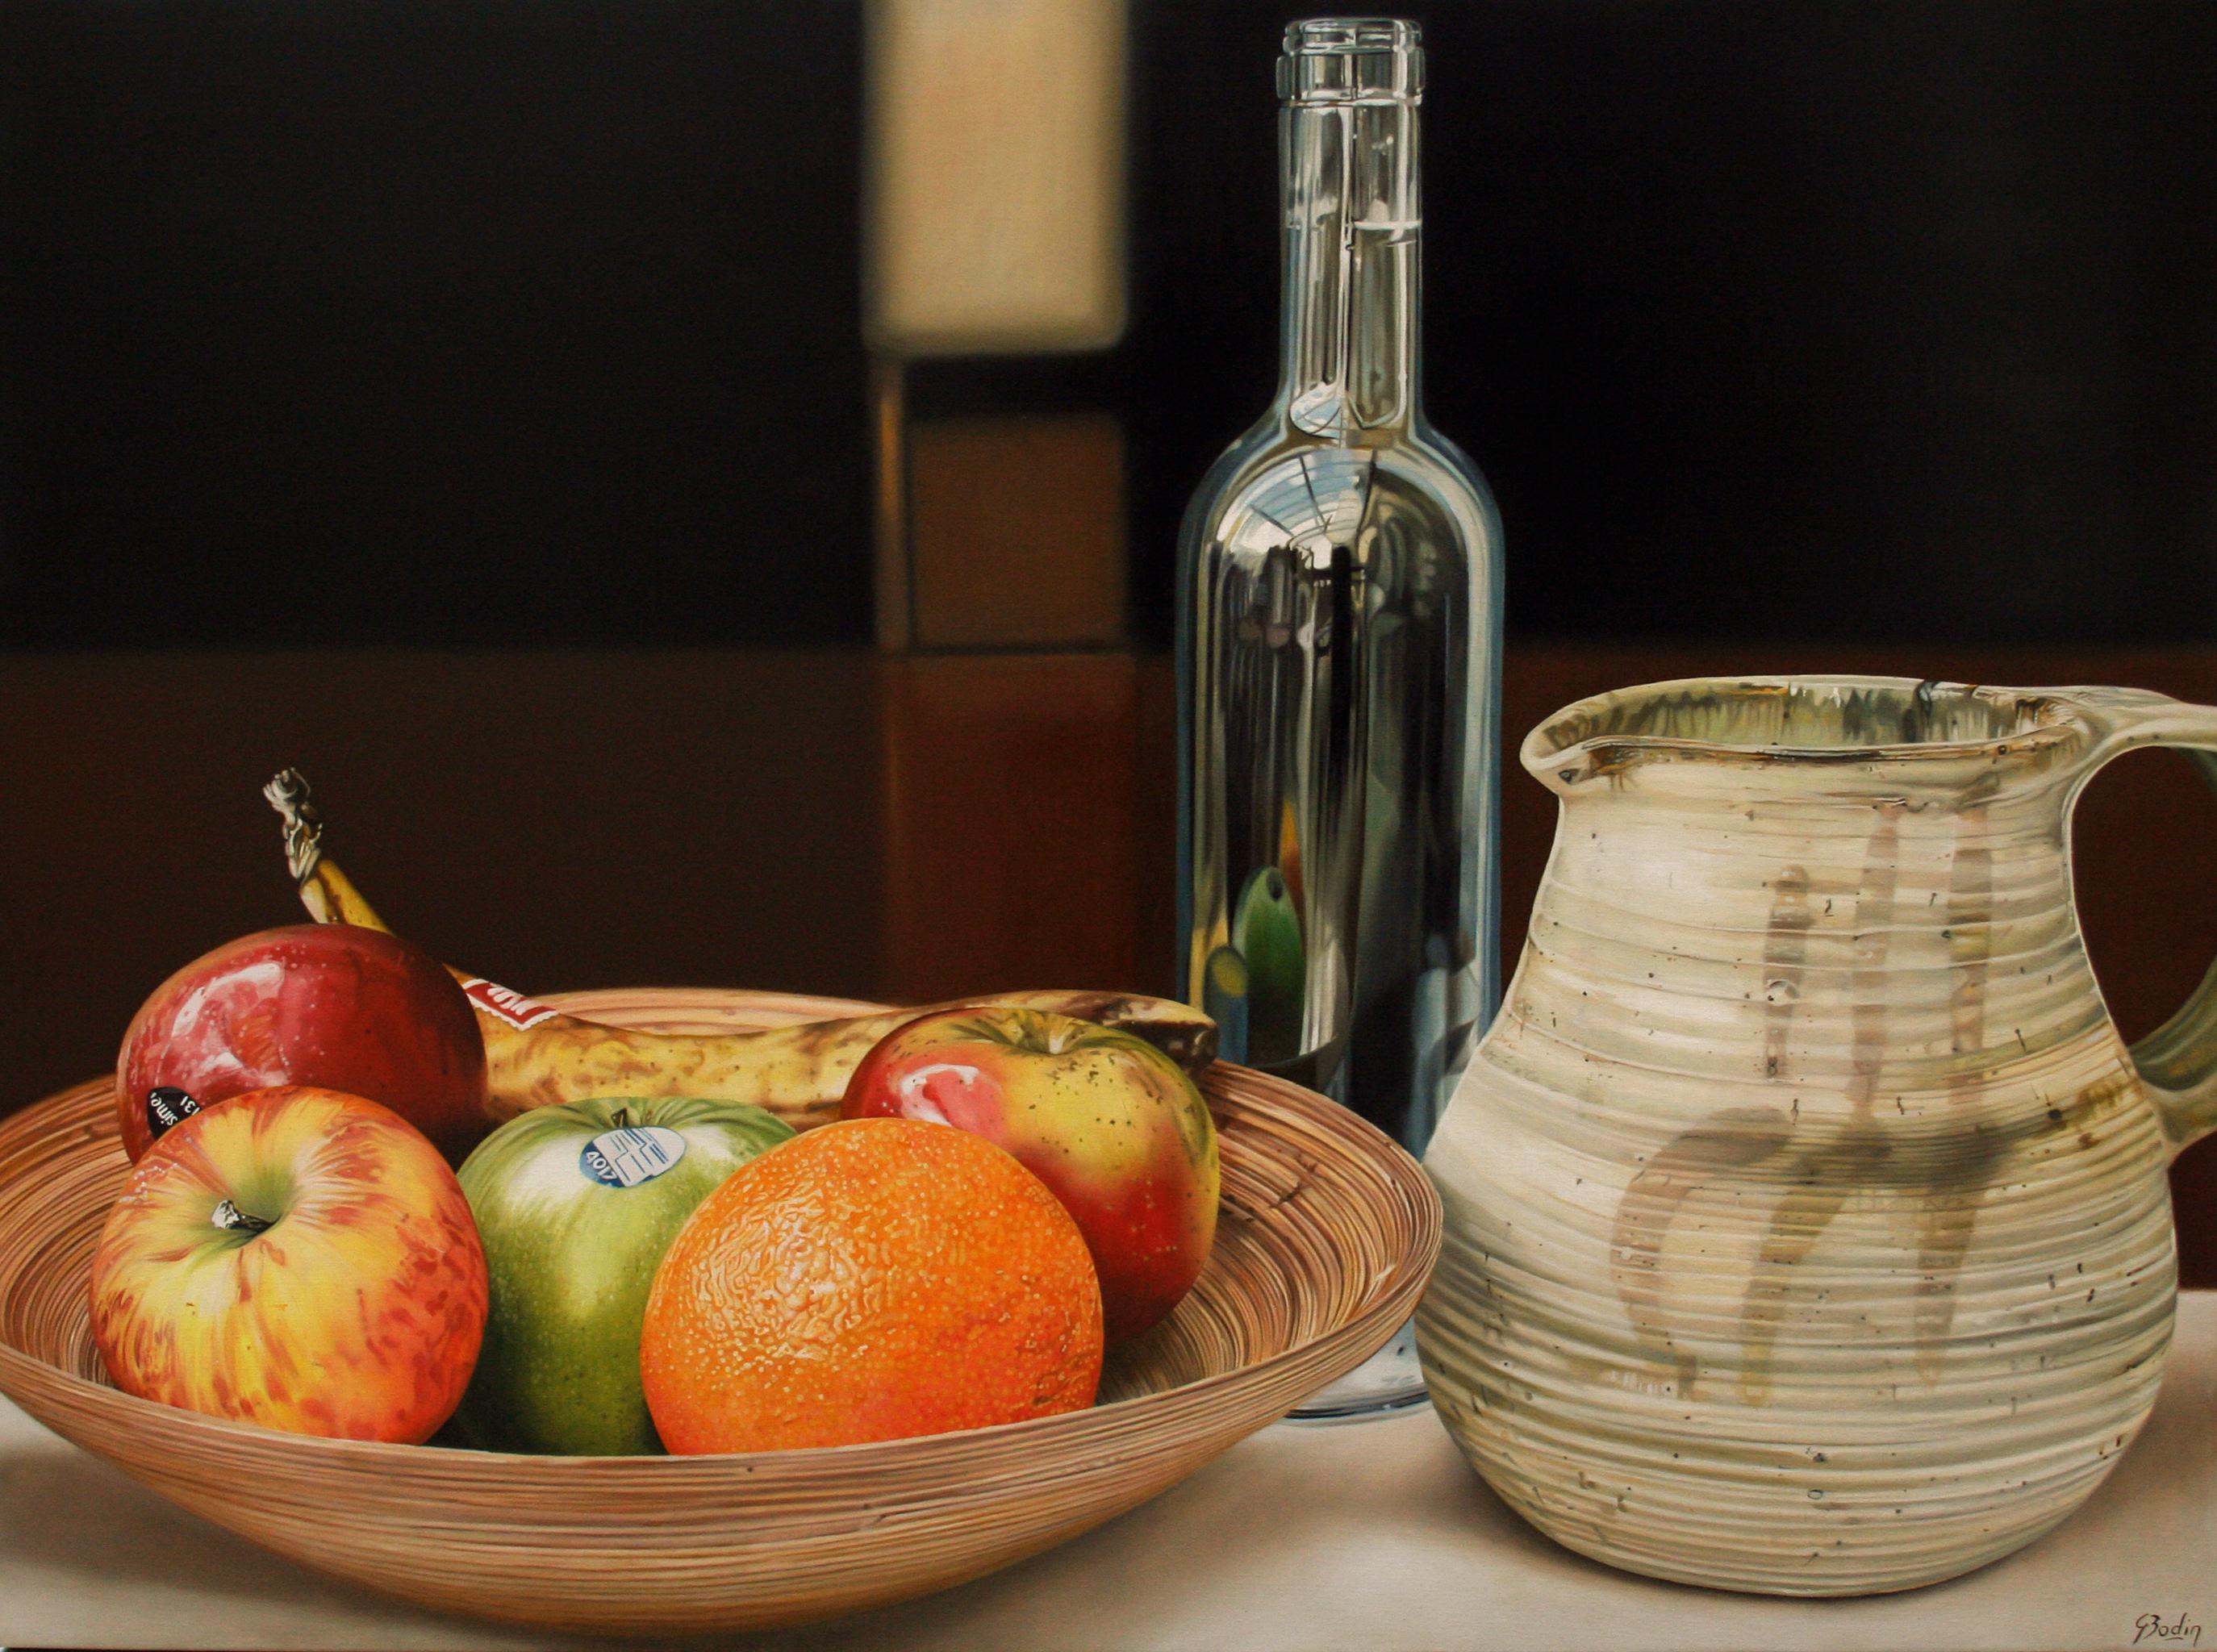 Jacques Bodin Fruits XXII